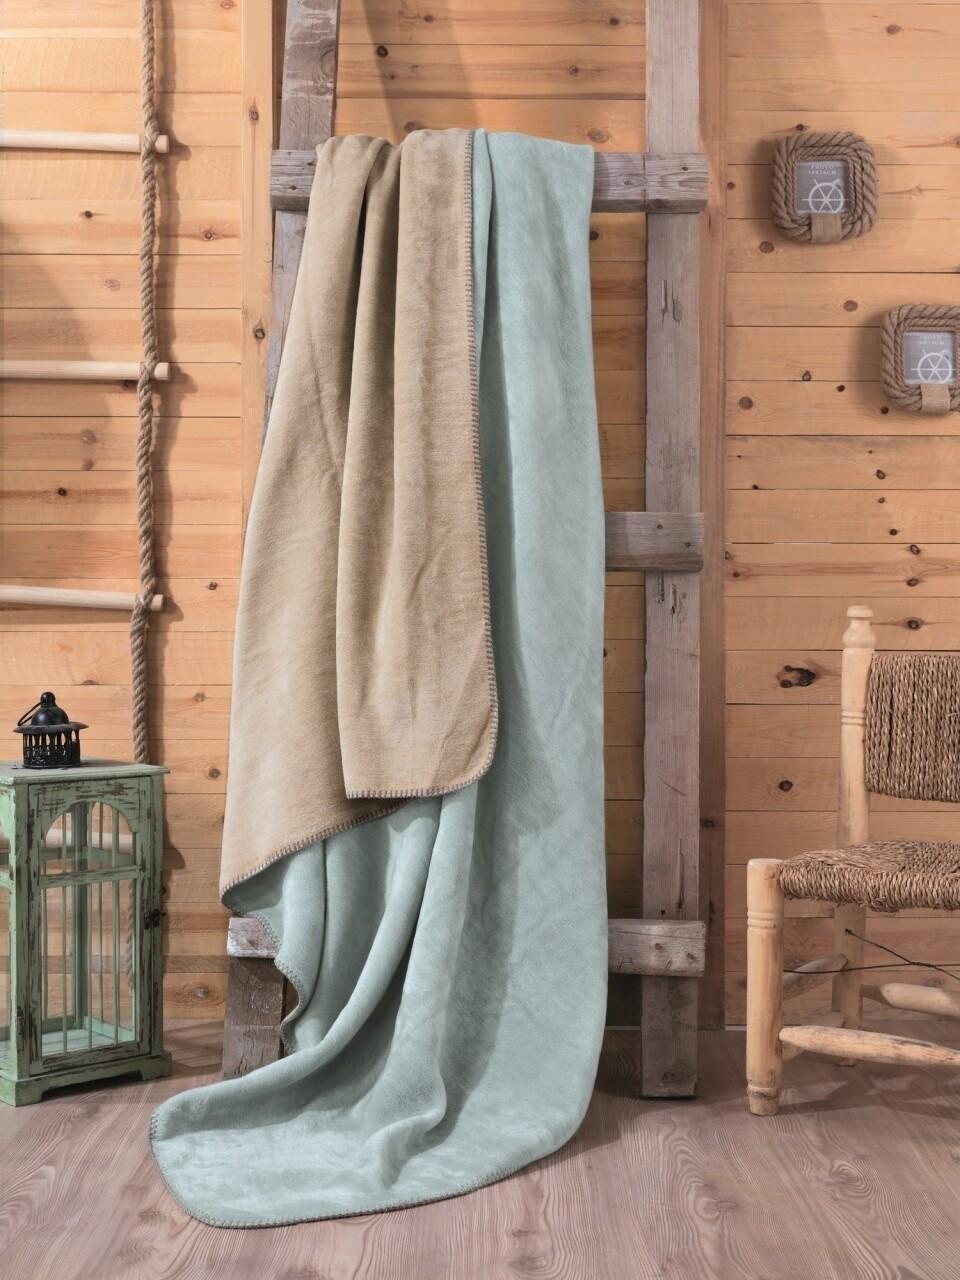 Patura pentru pat dublu din bumbac si acrylic, 200x200 cm, Cotton Box, menta/bej